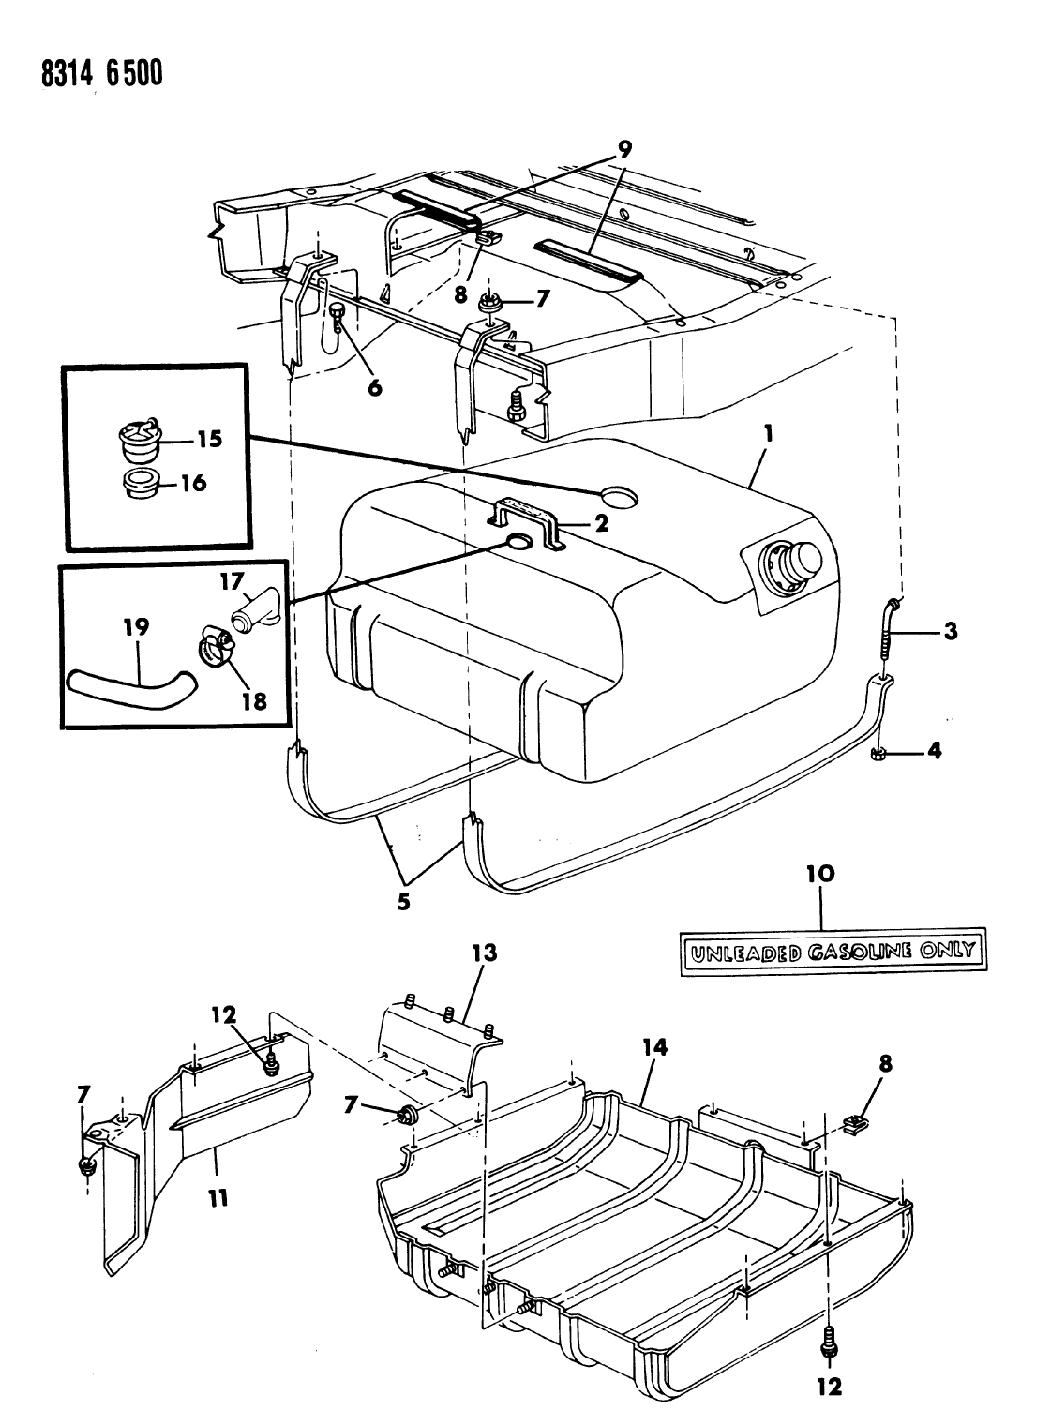 1988 Dodge Ramcharger Fuel Tank - Thumbnail 2